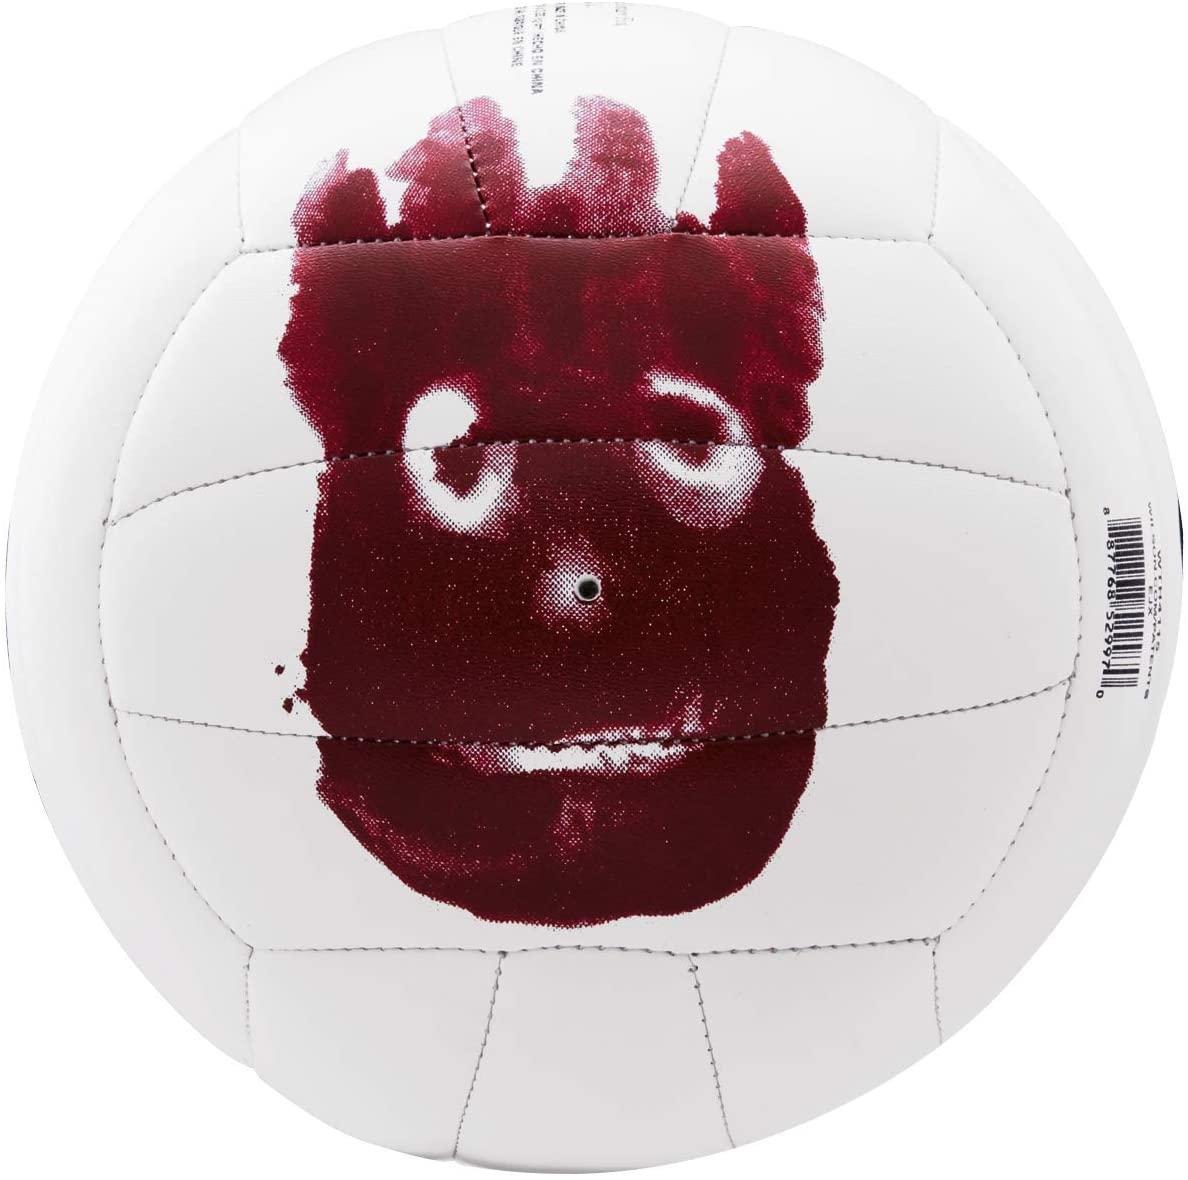 Wilson Beachvolleyball Mr. Wilson (Cast Away) für 10,14€ (Amazon UK)